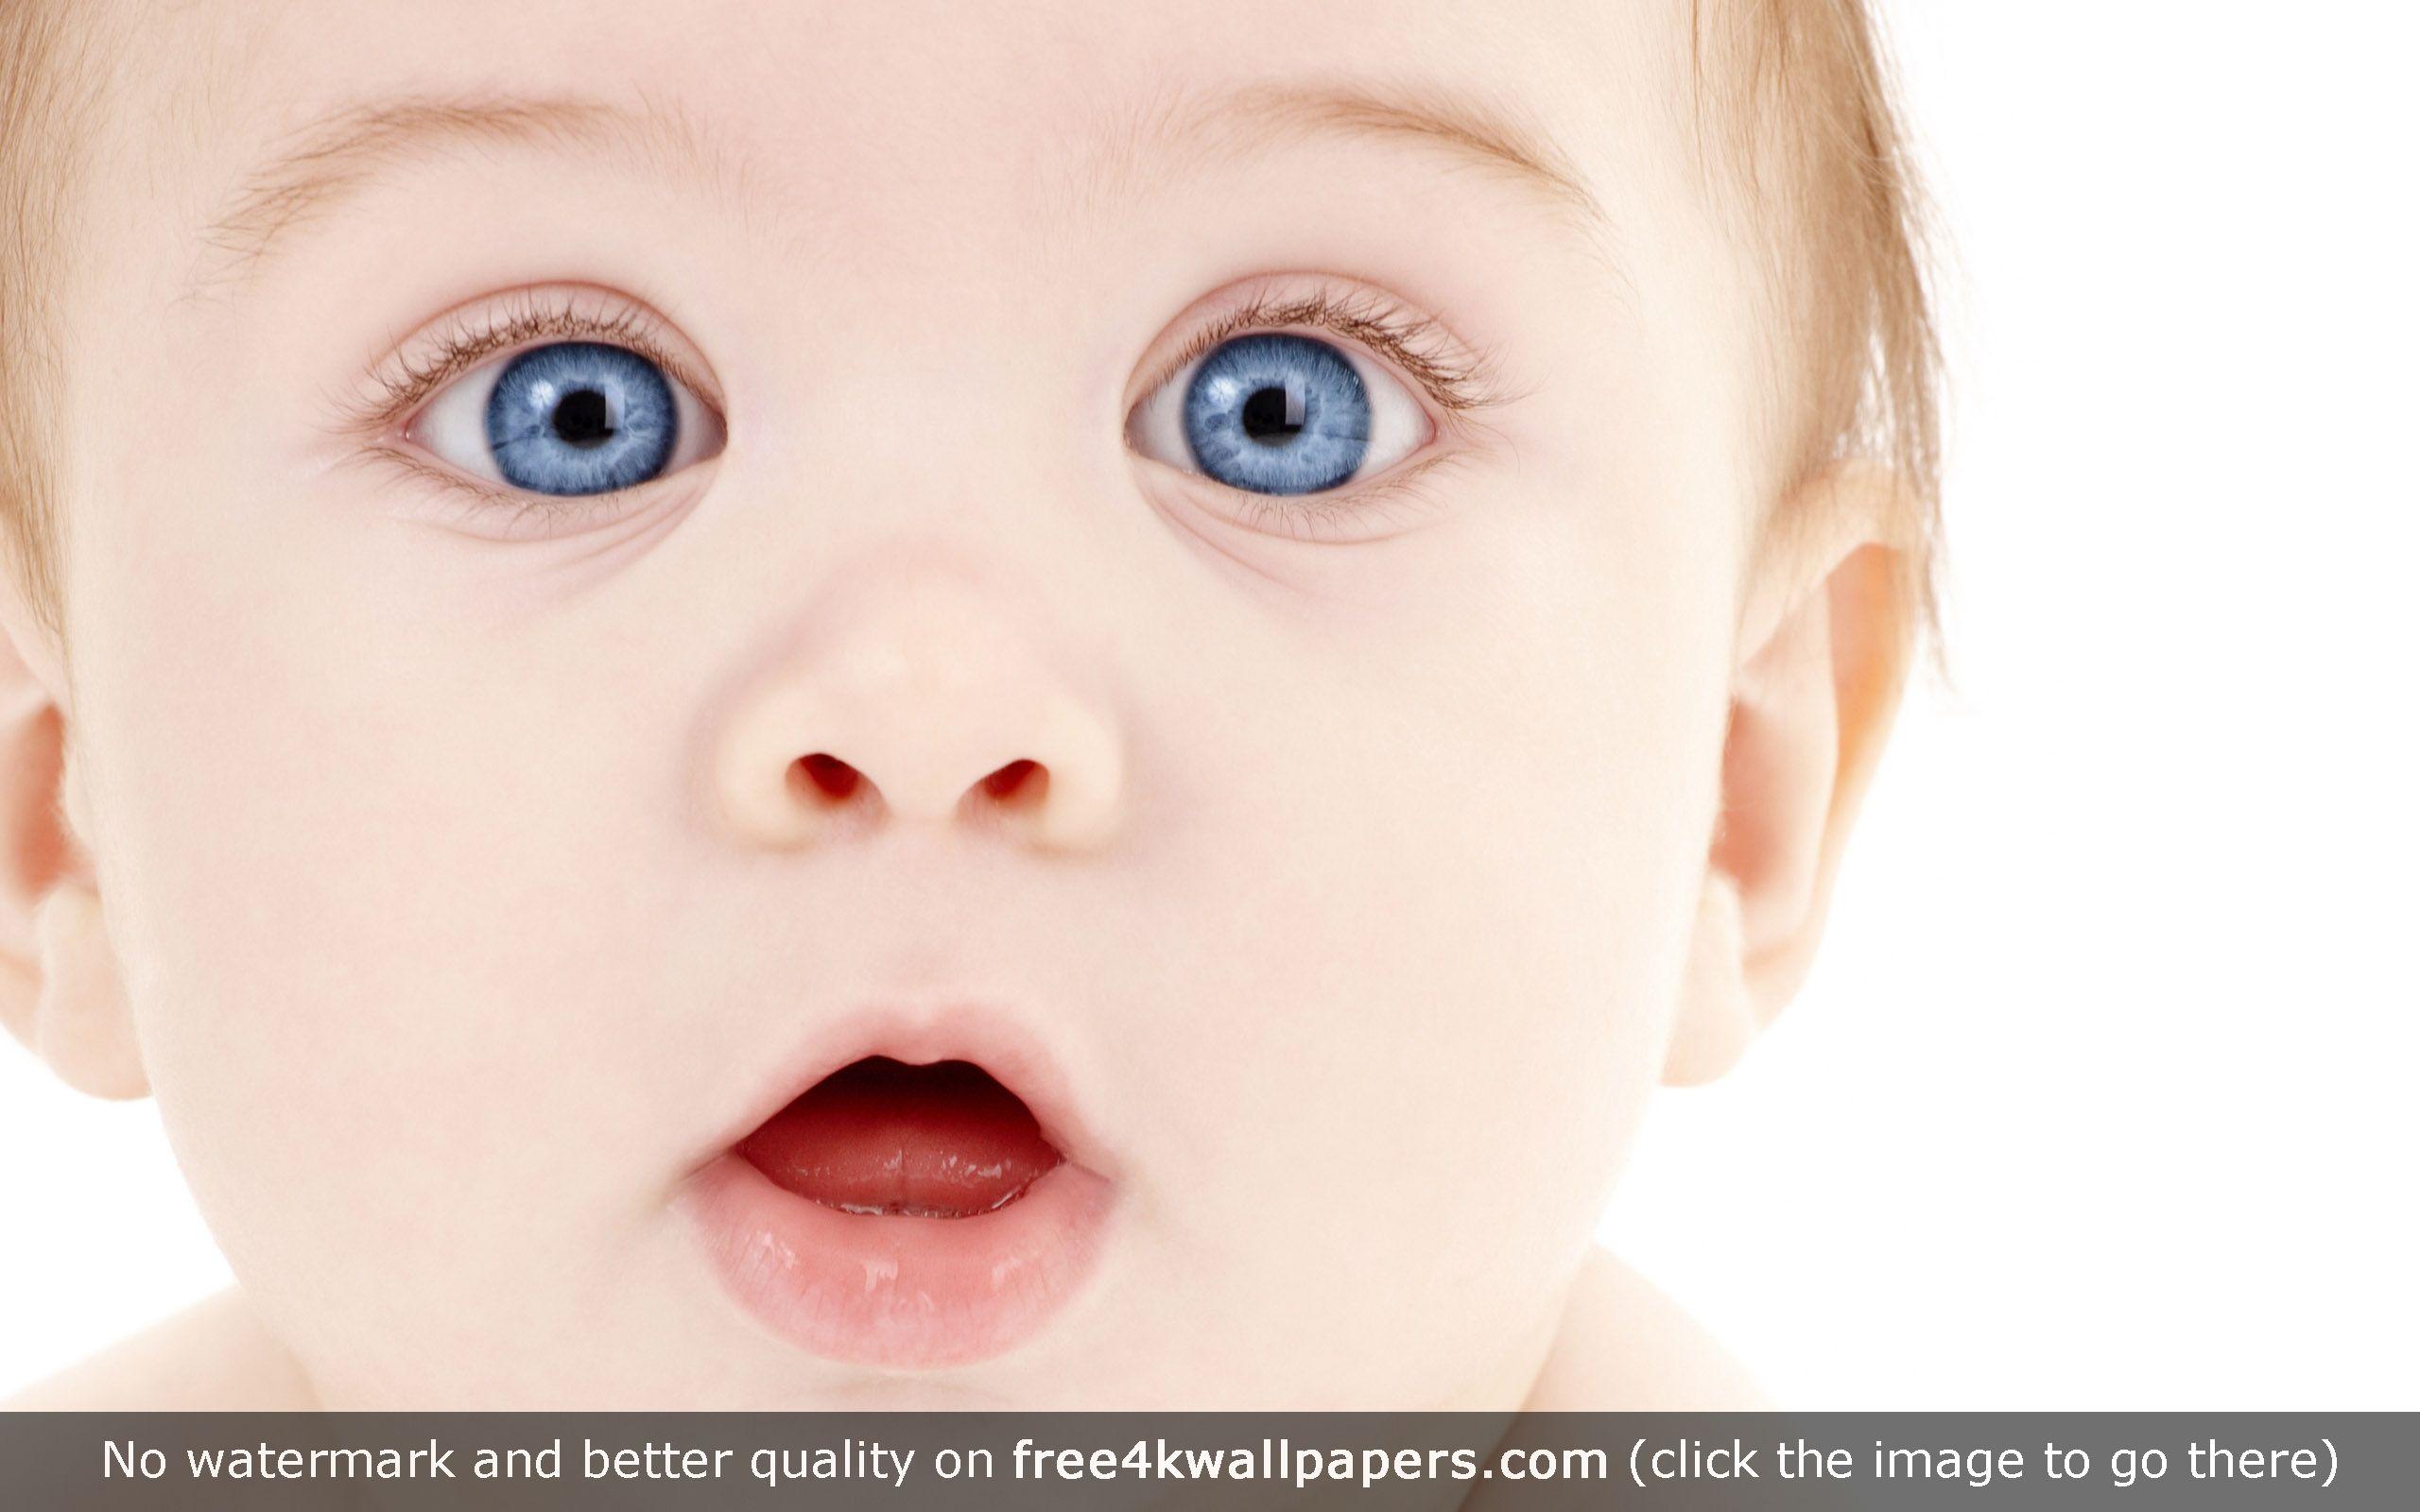 Blue Eyes Cute Baby HD Wallpaper